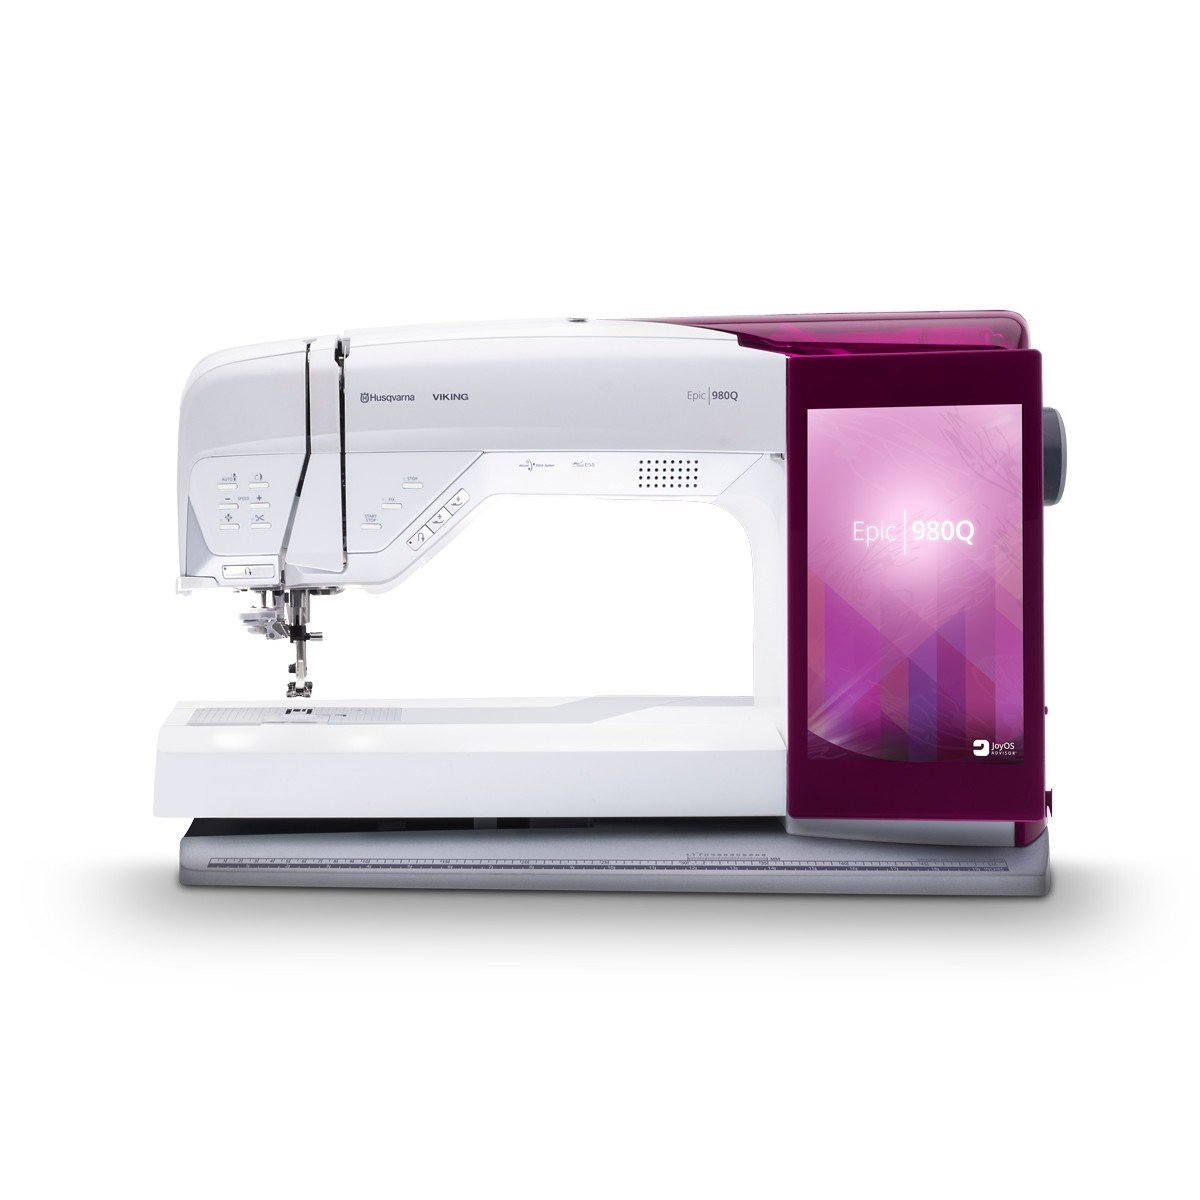 Husqvarna Viking - EPIC 980Q - Sewing Machine